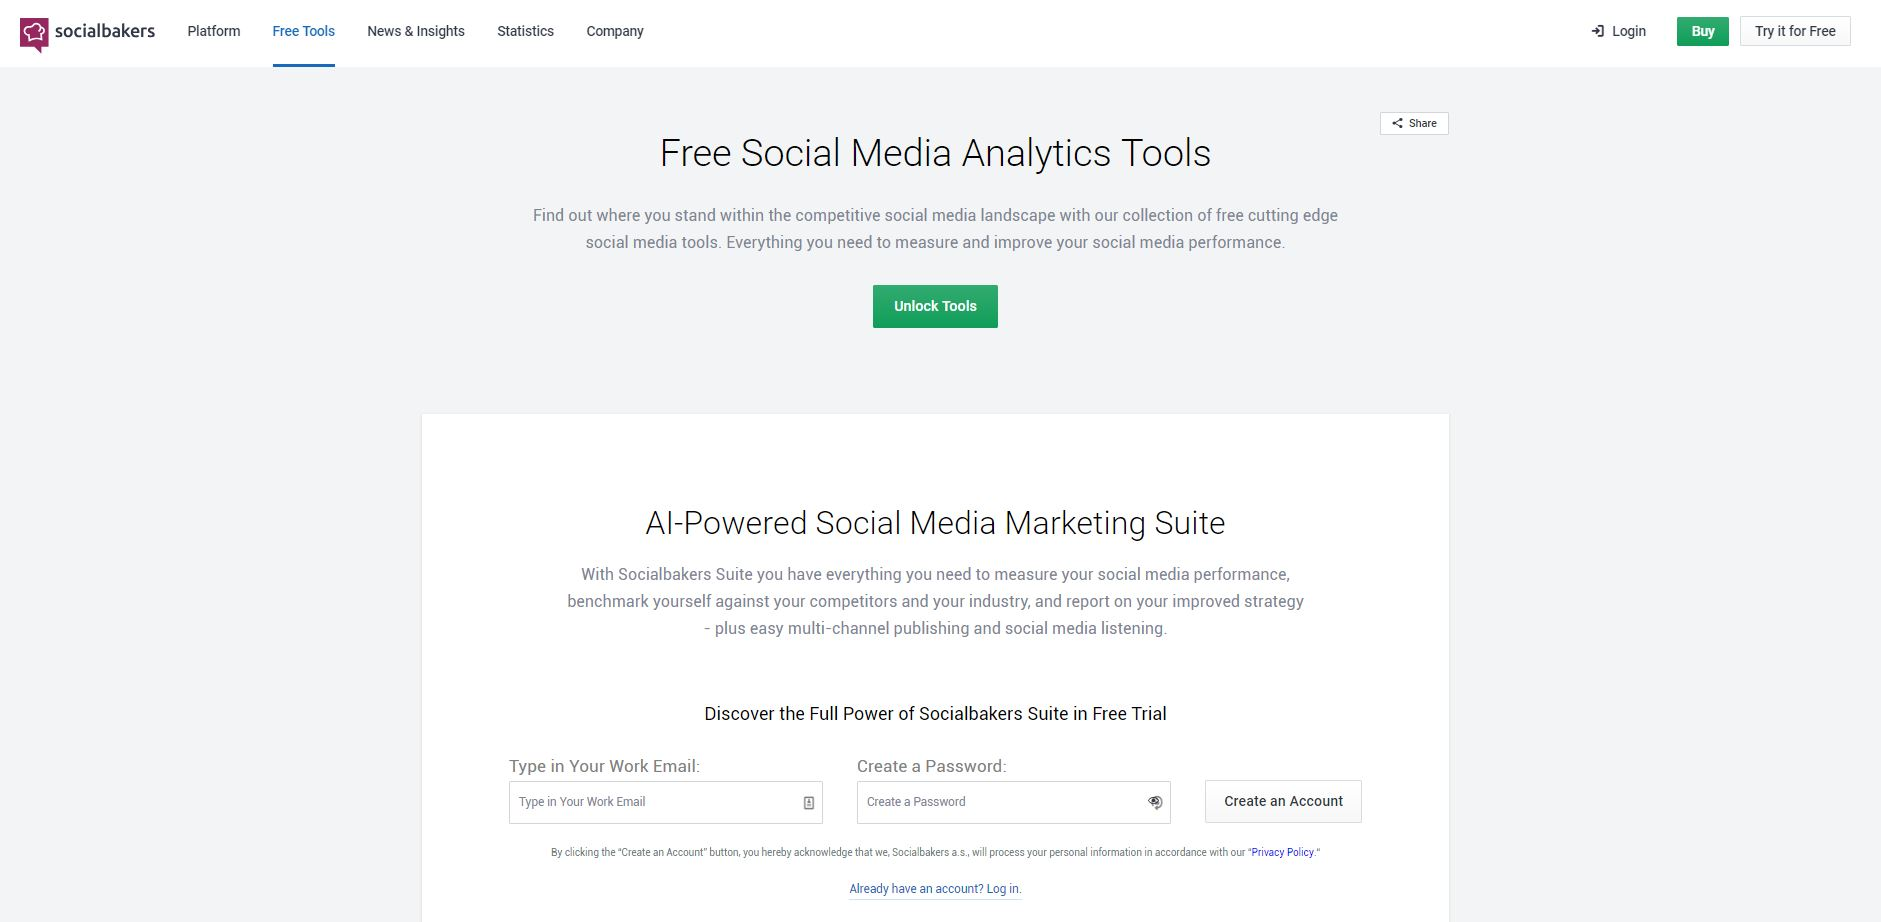 socialbakers free social tools